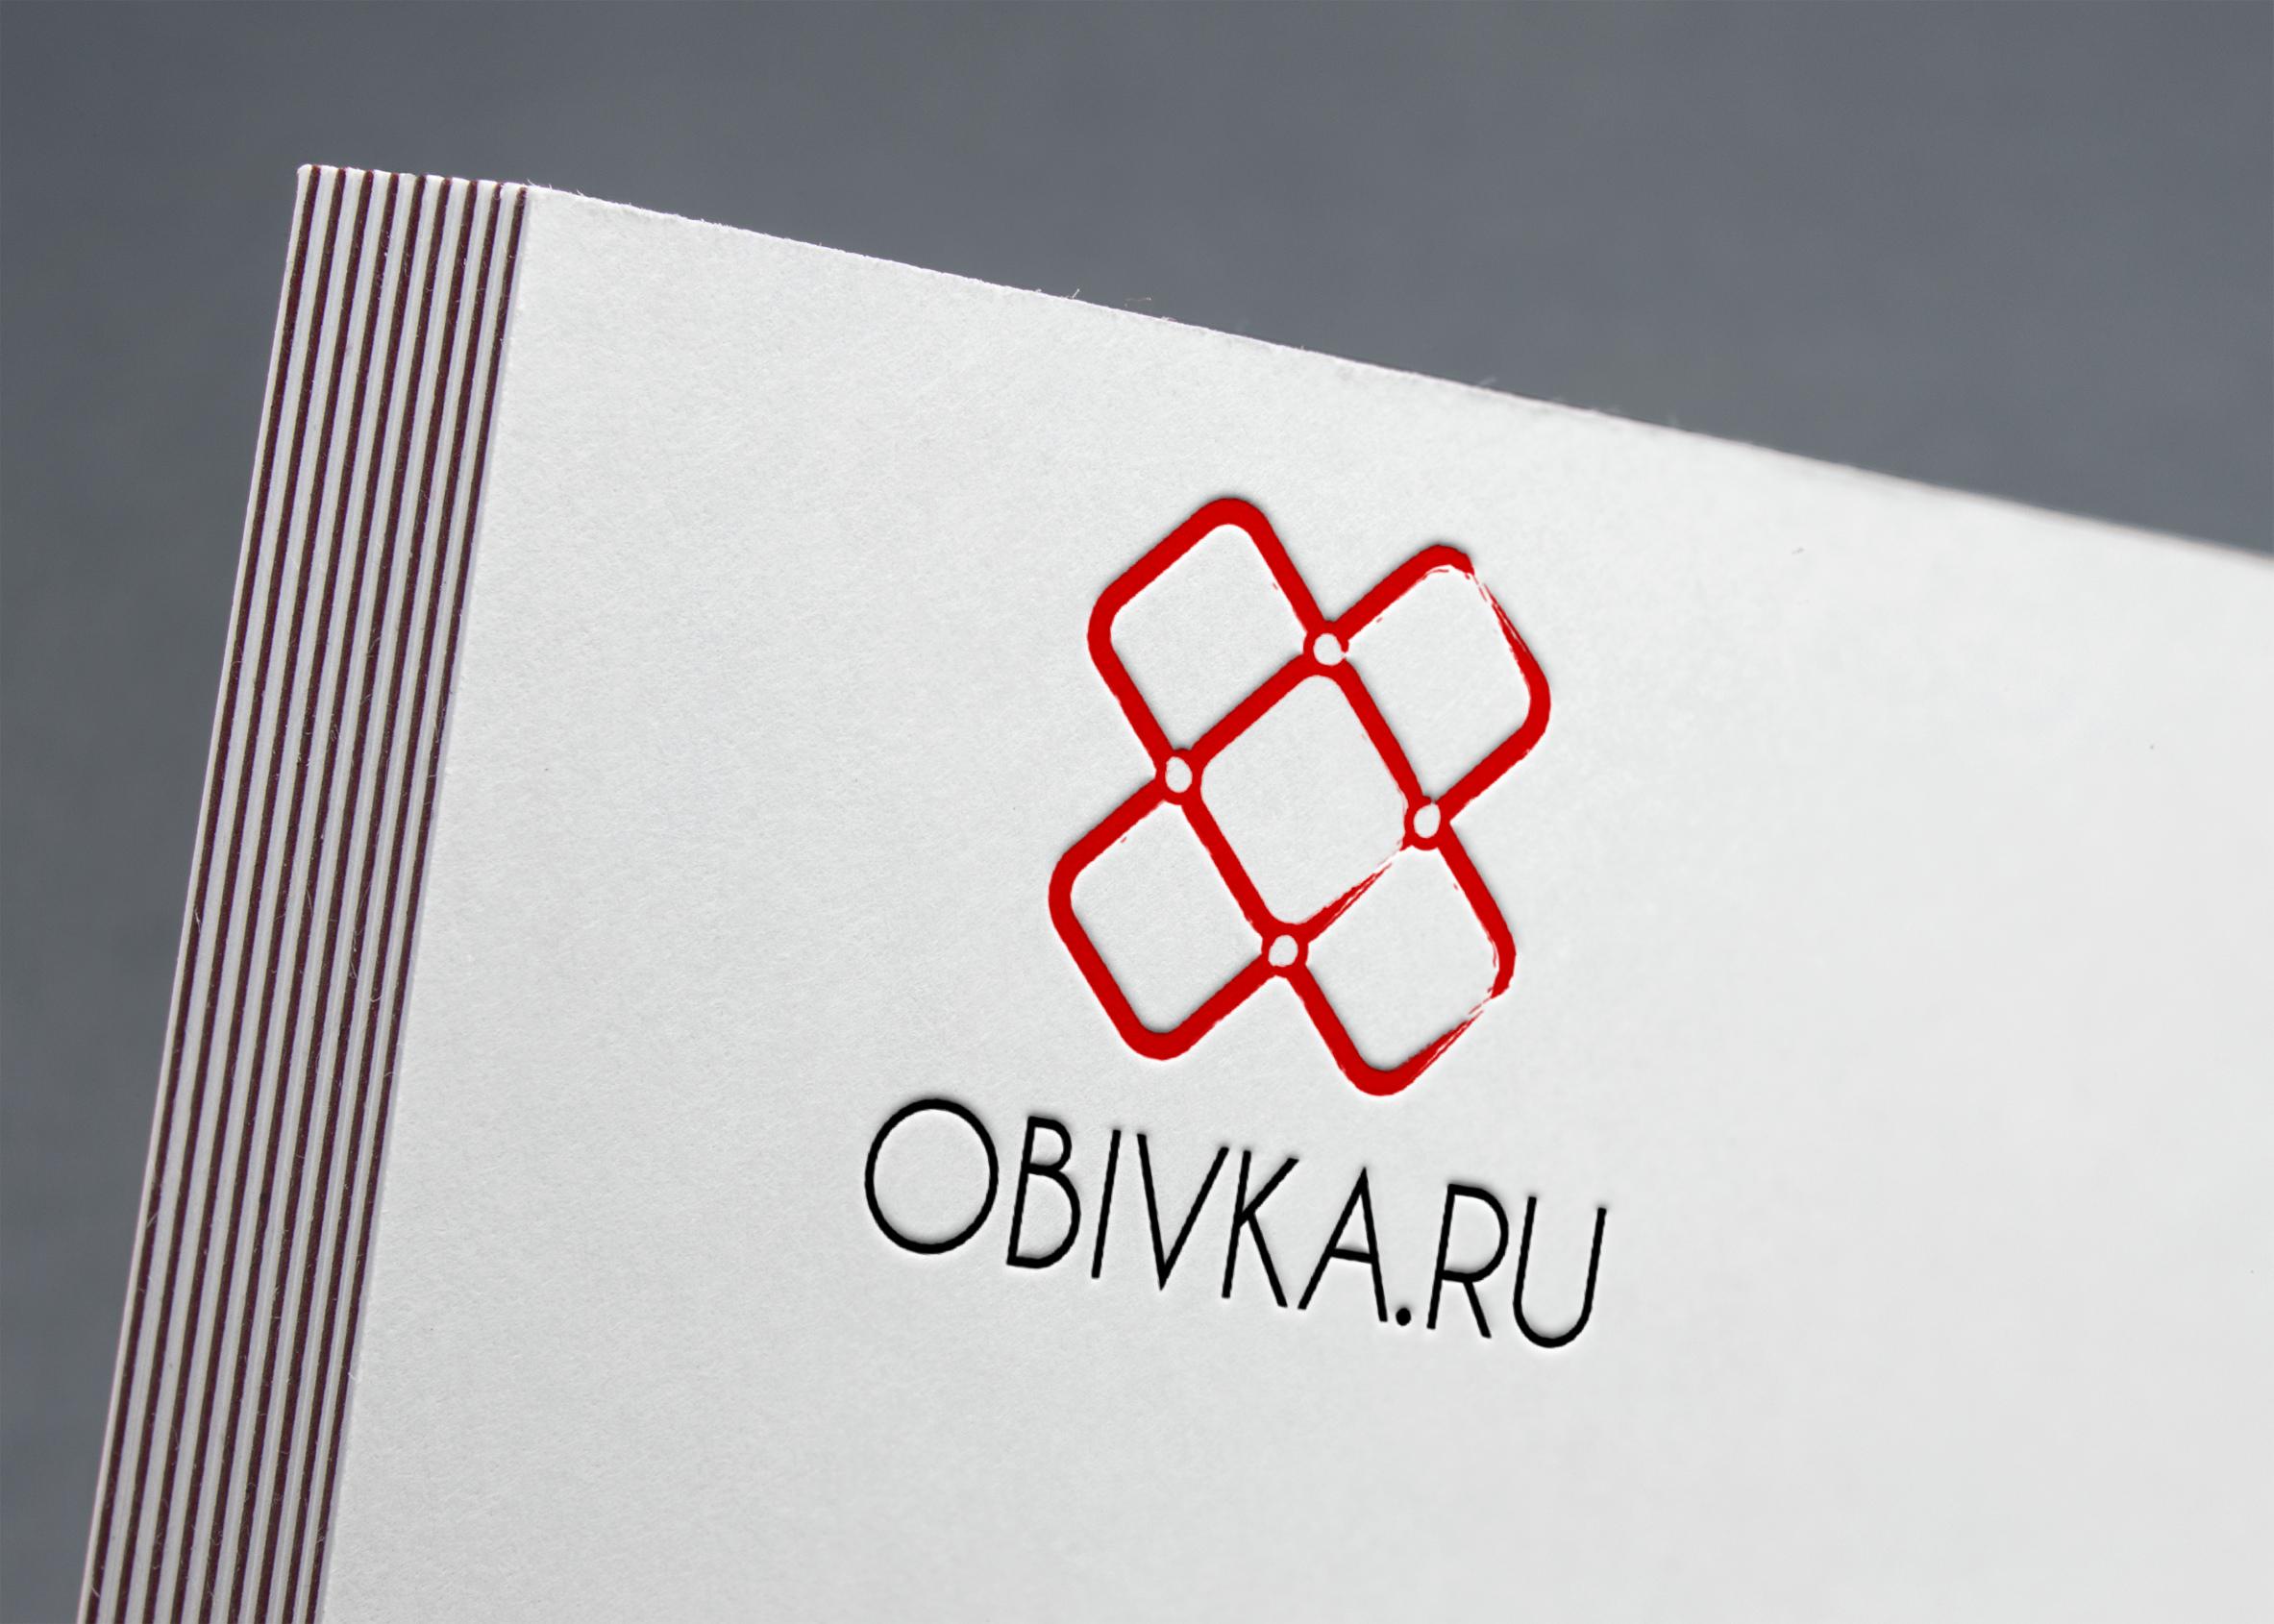 Логотип для сайта OBIVKA.RU фото f_6425c10cdad48b47.jpg